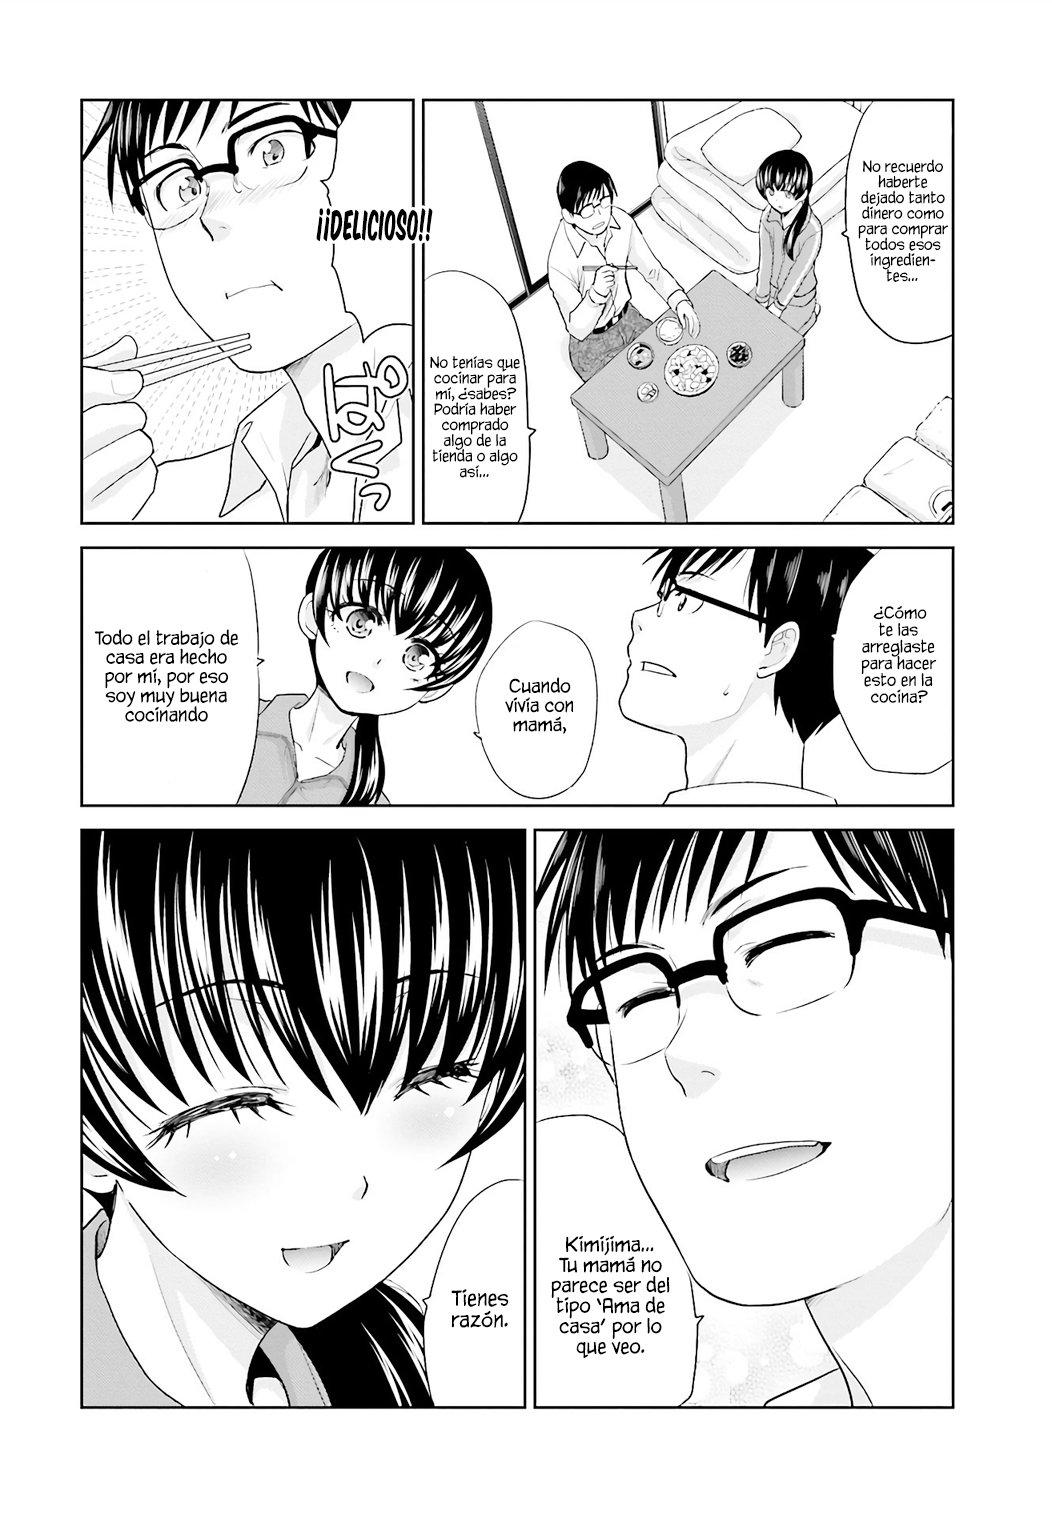 https://nine.mangadogs.com/es_manga/pic8/48/36656/946258/d8e6d68a889eae70a907d2335ca1ed5d.jpg Page 31